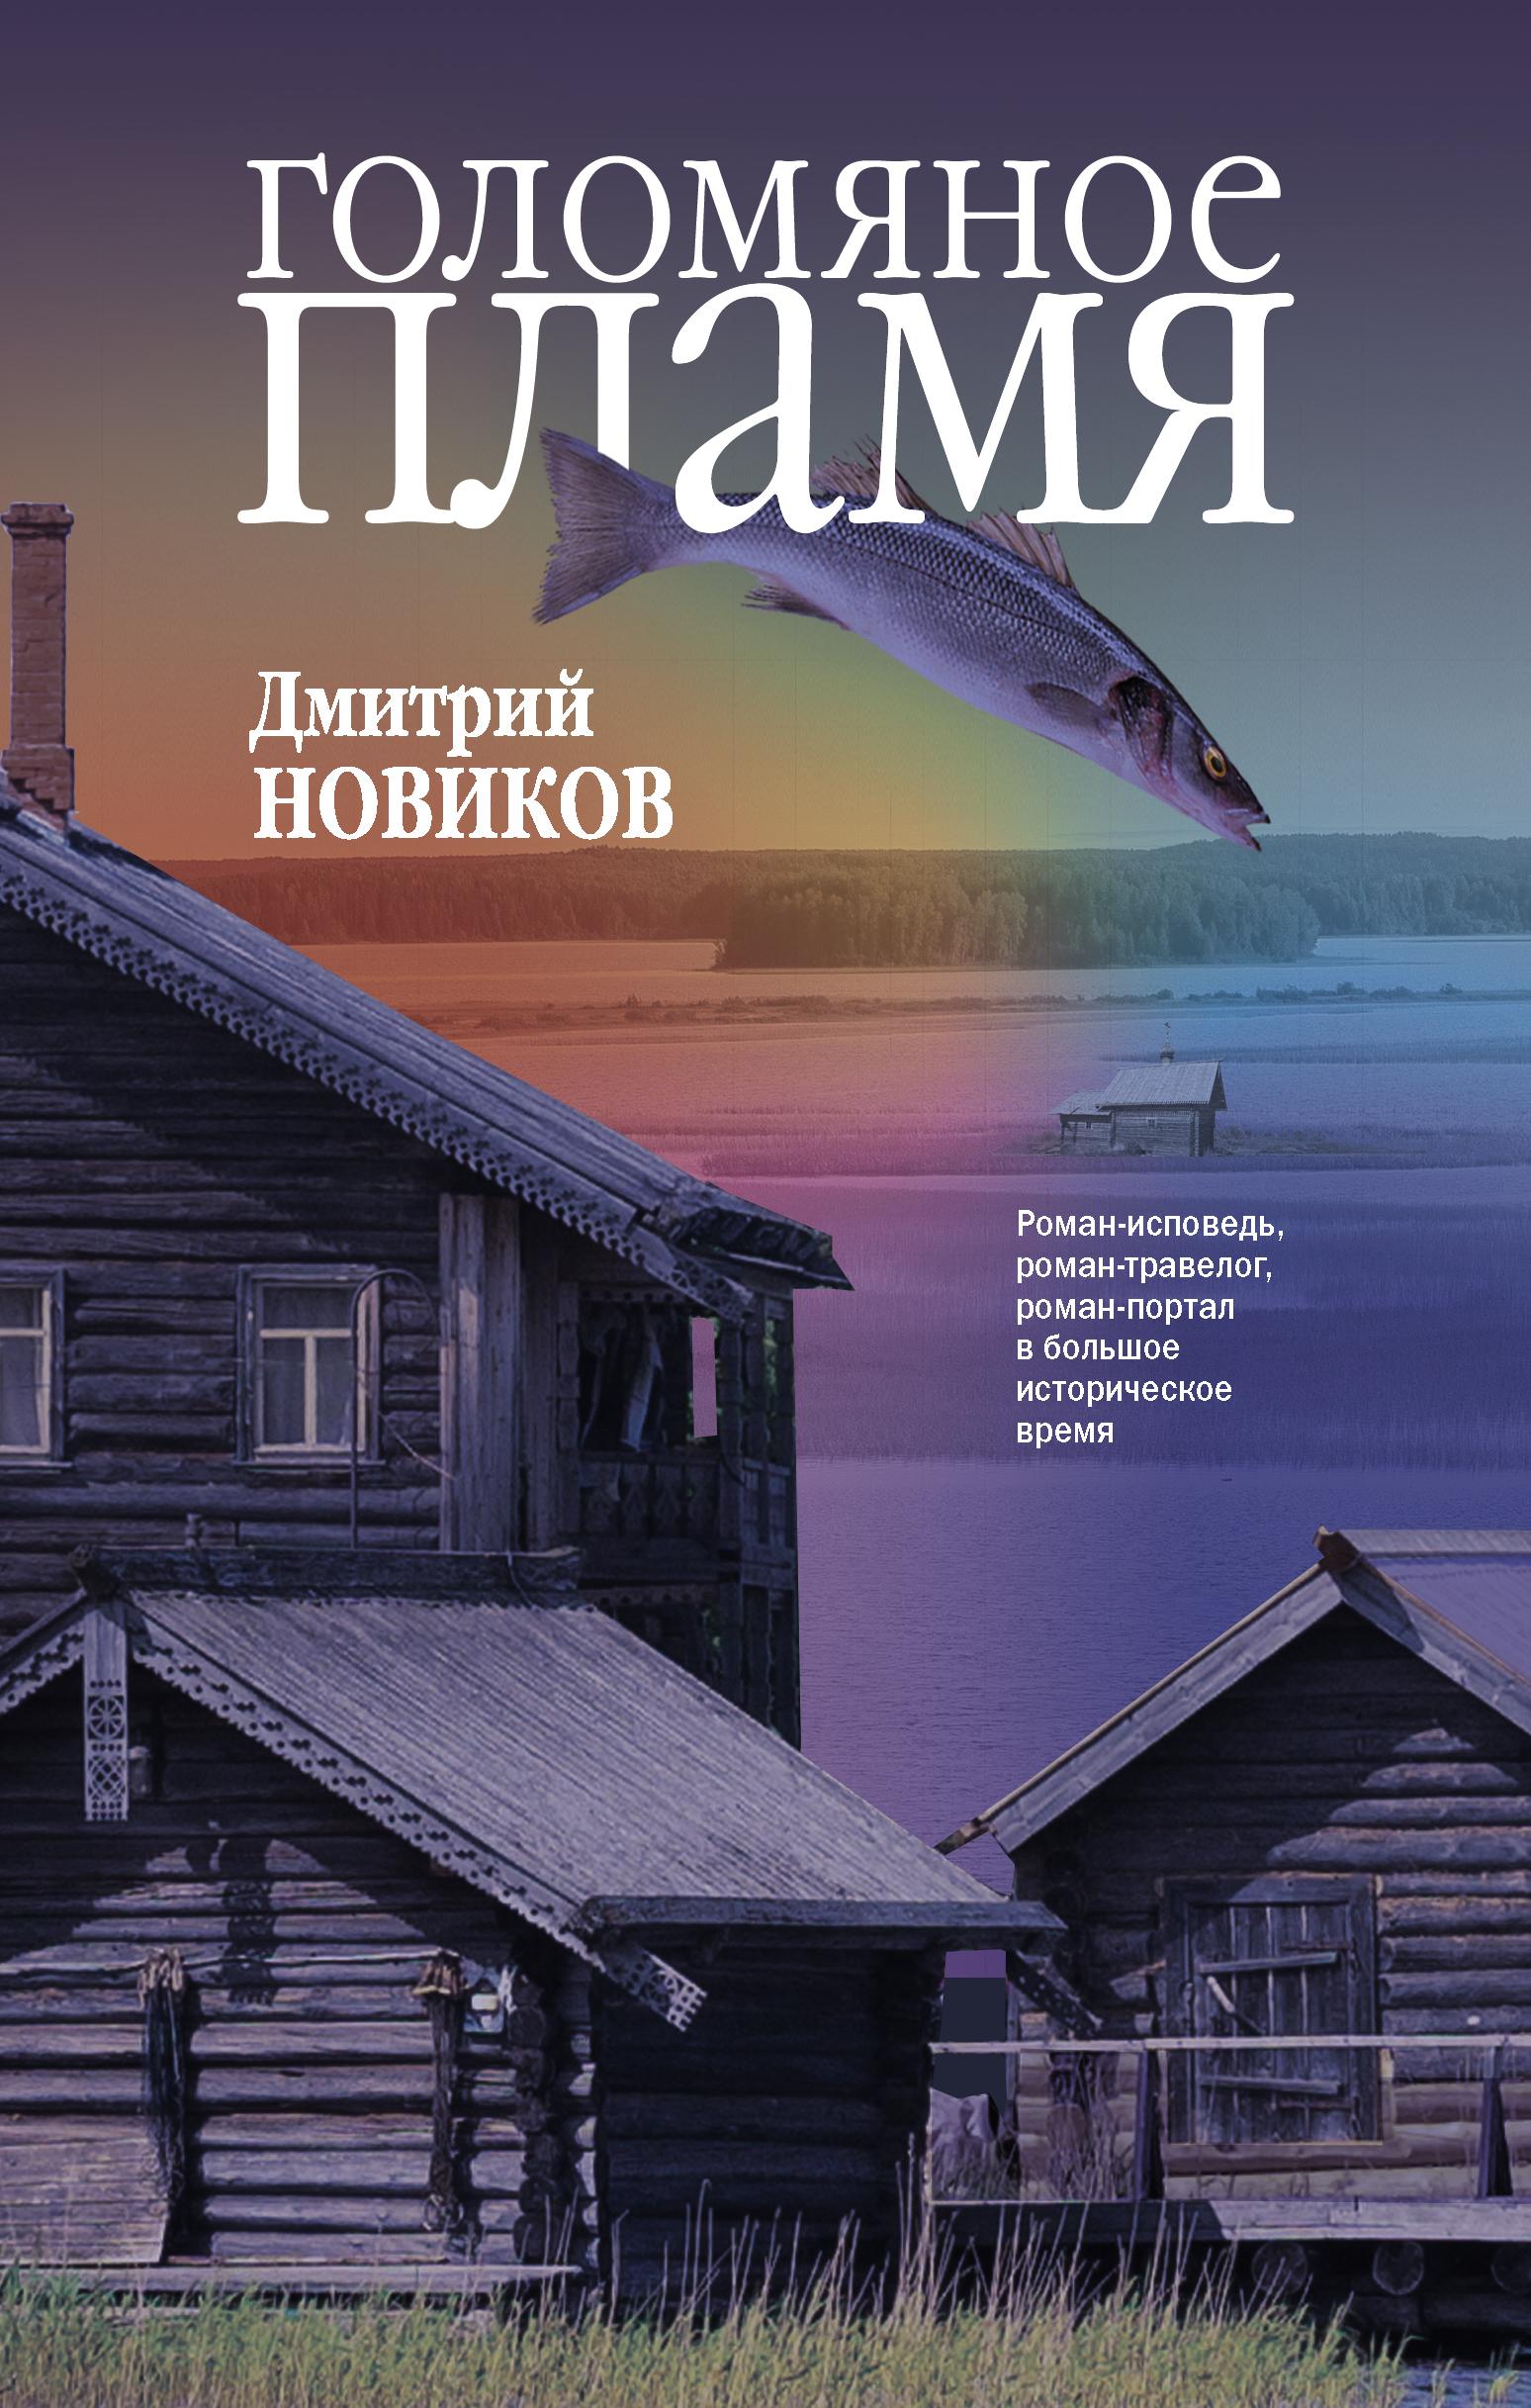 Новиков Д.Г. Голомяное пламя